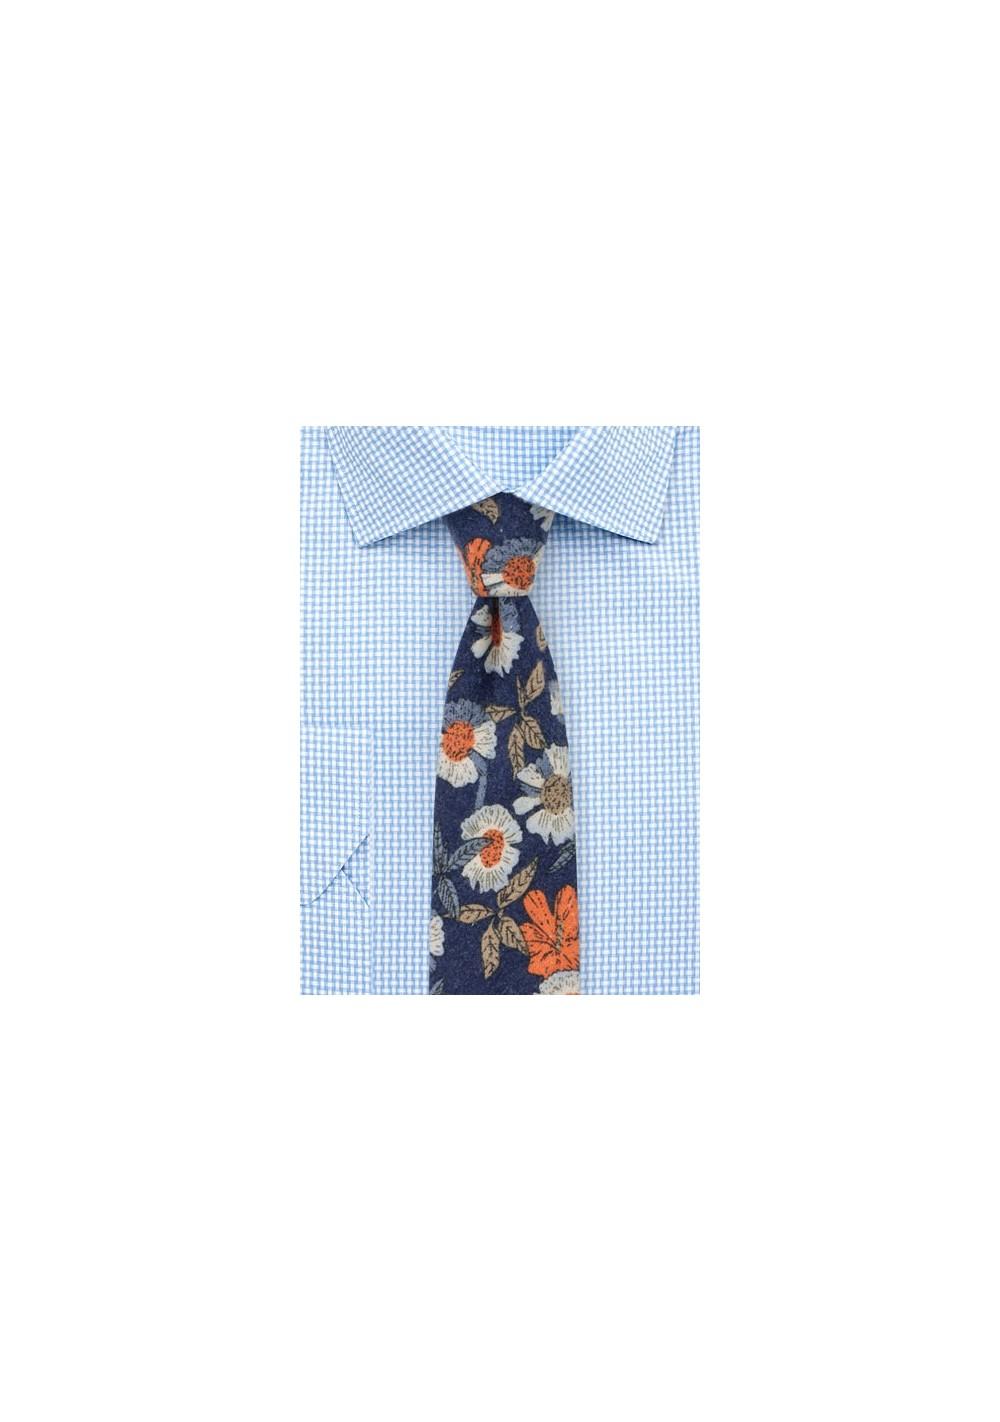 Flannel Cotton Print Tie with Floral Desgin